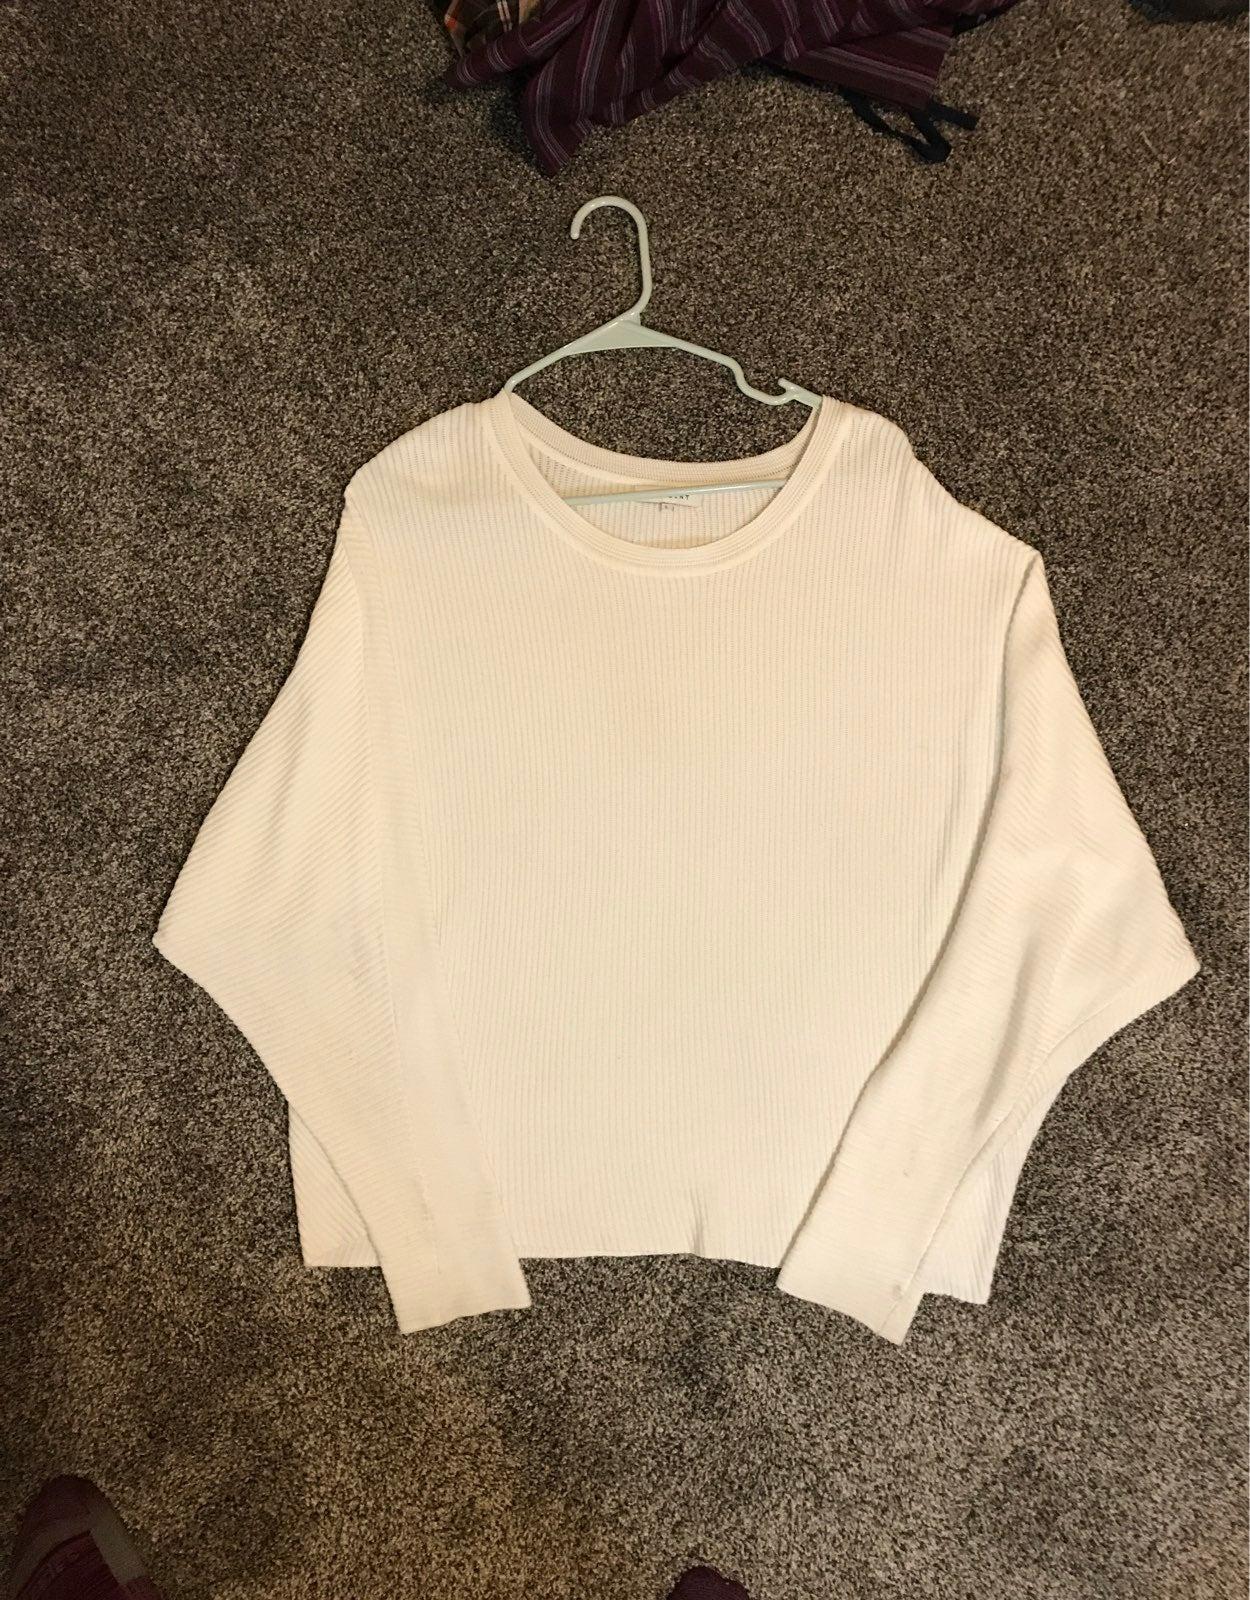 Crescent sweater